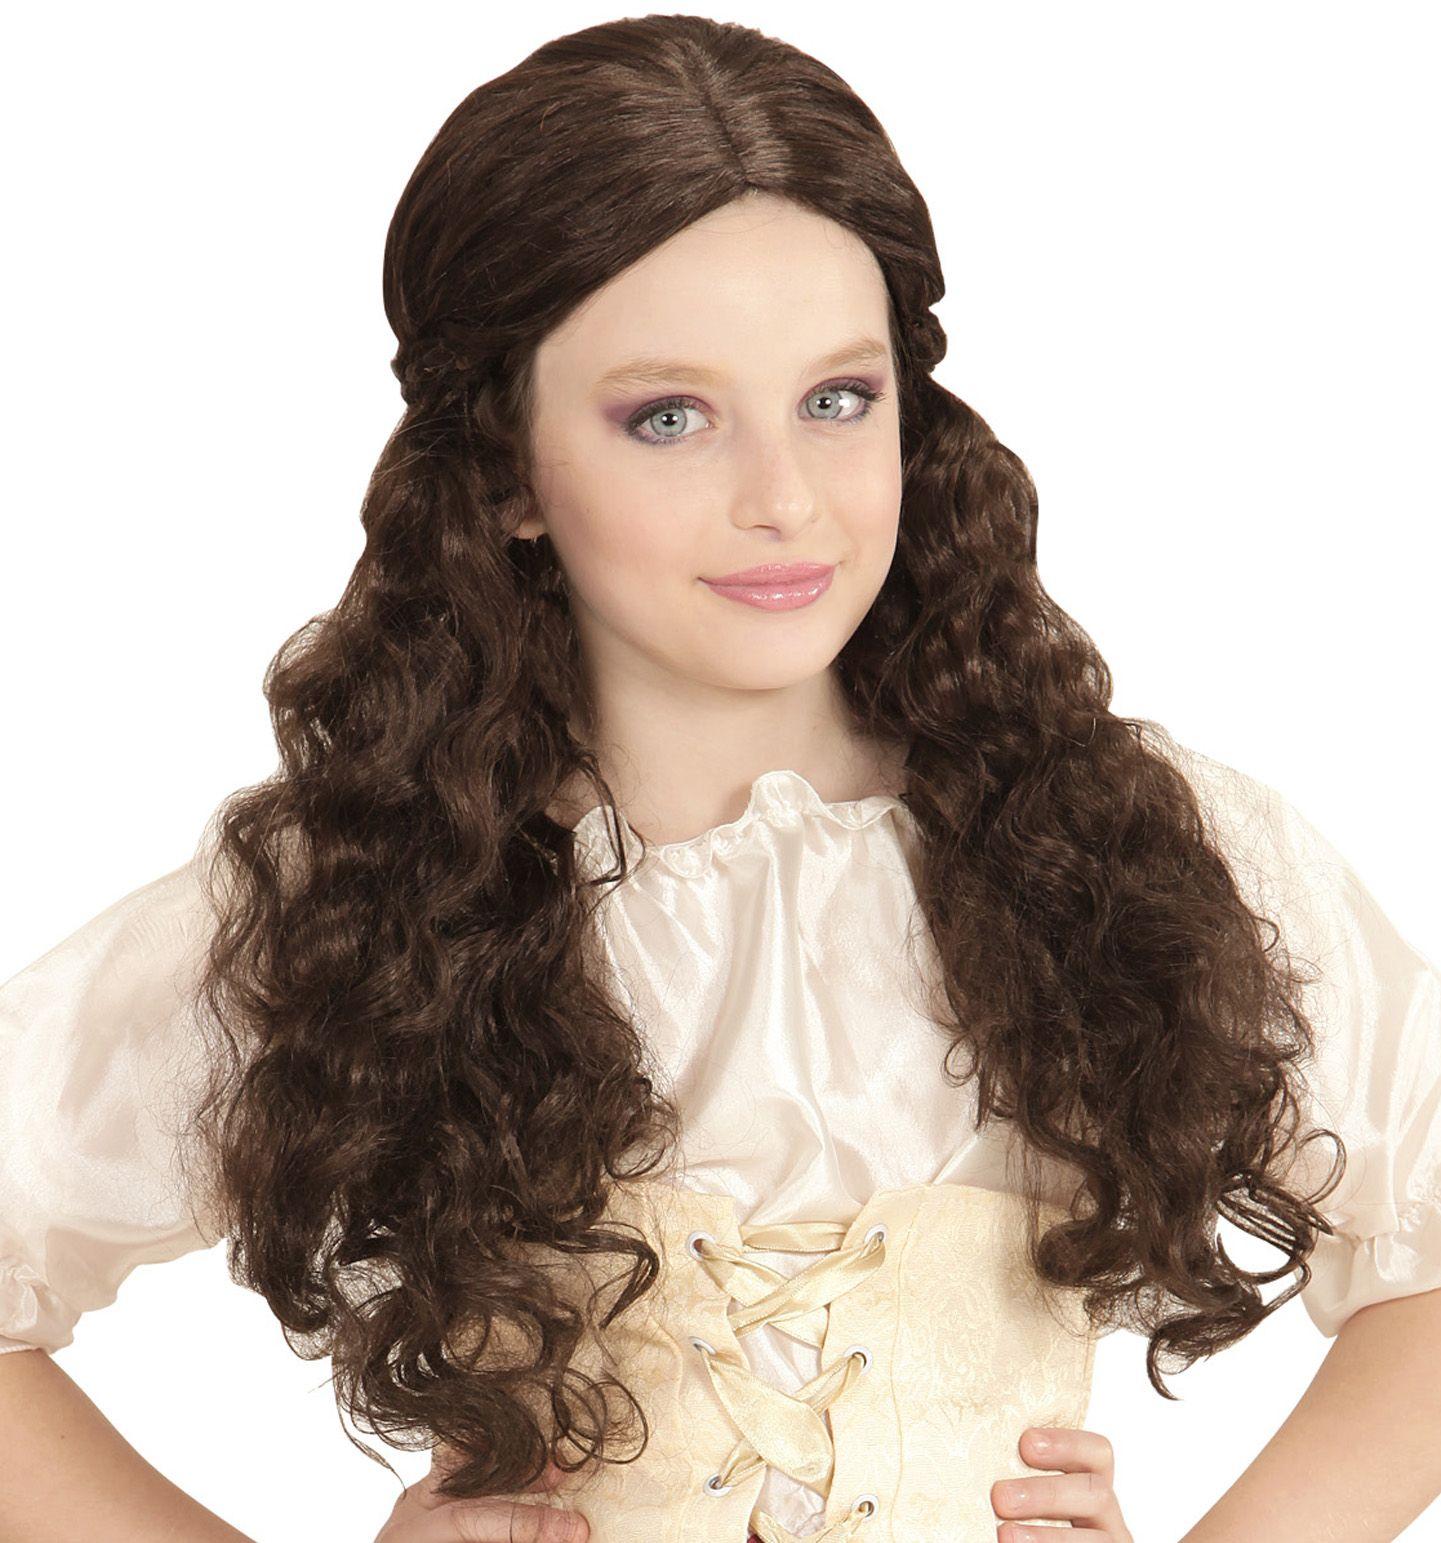 Bruine middeleeuwse meisjes pruik